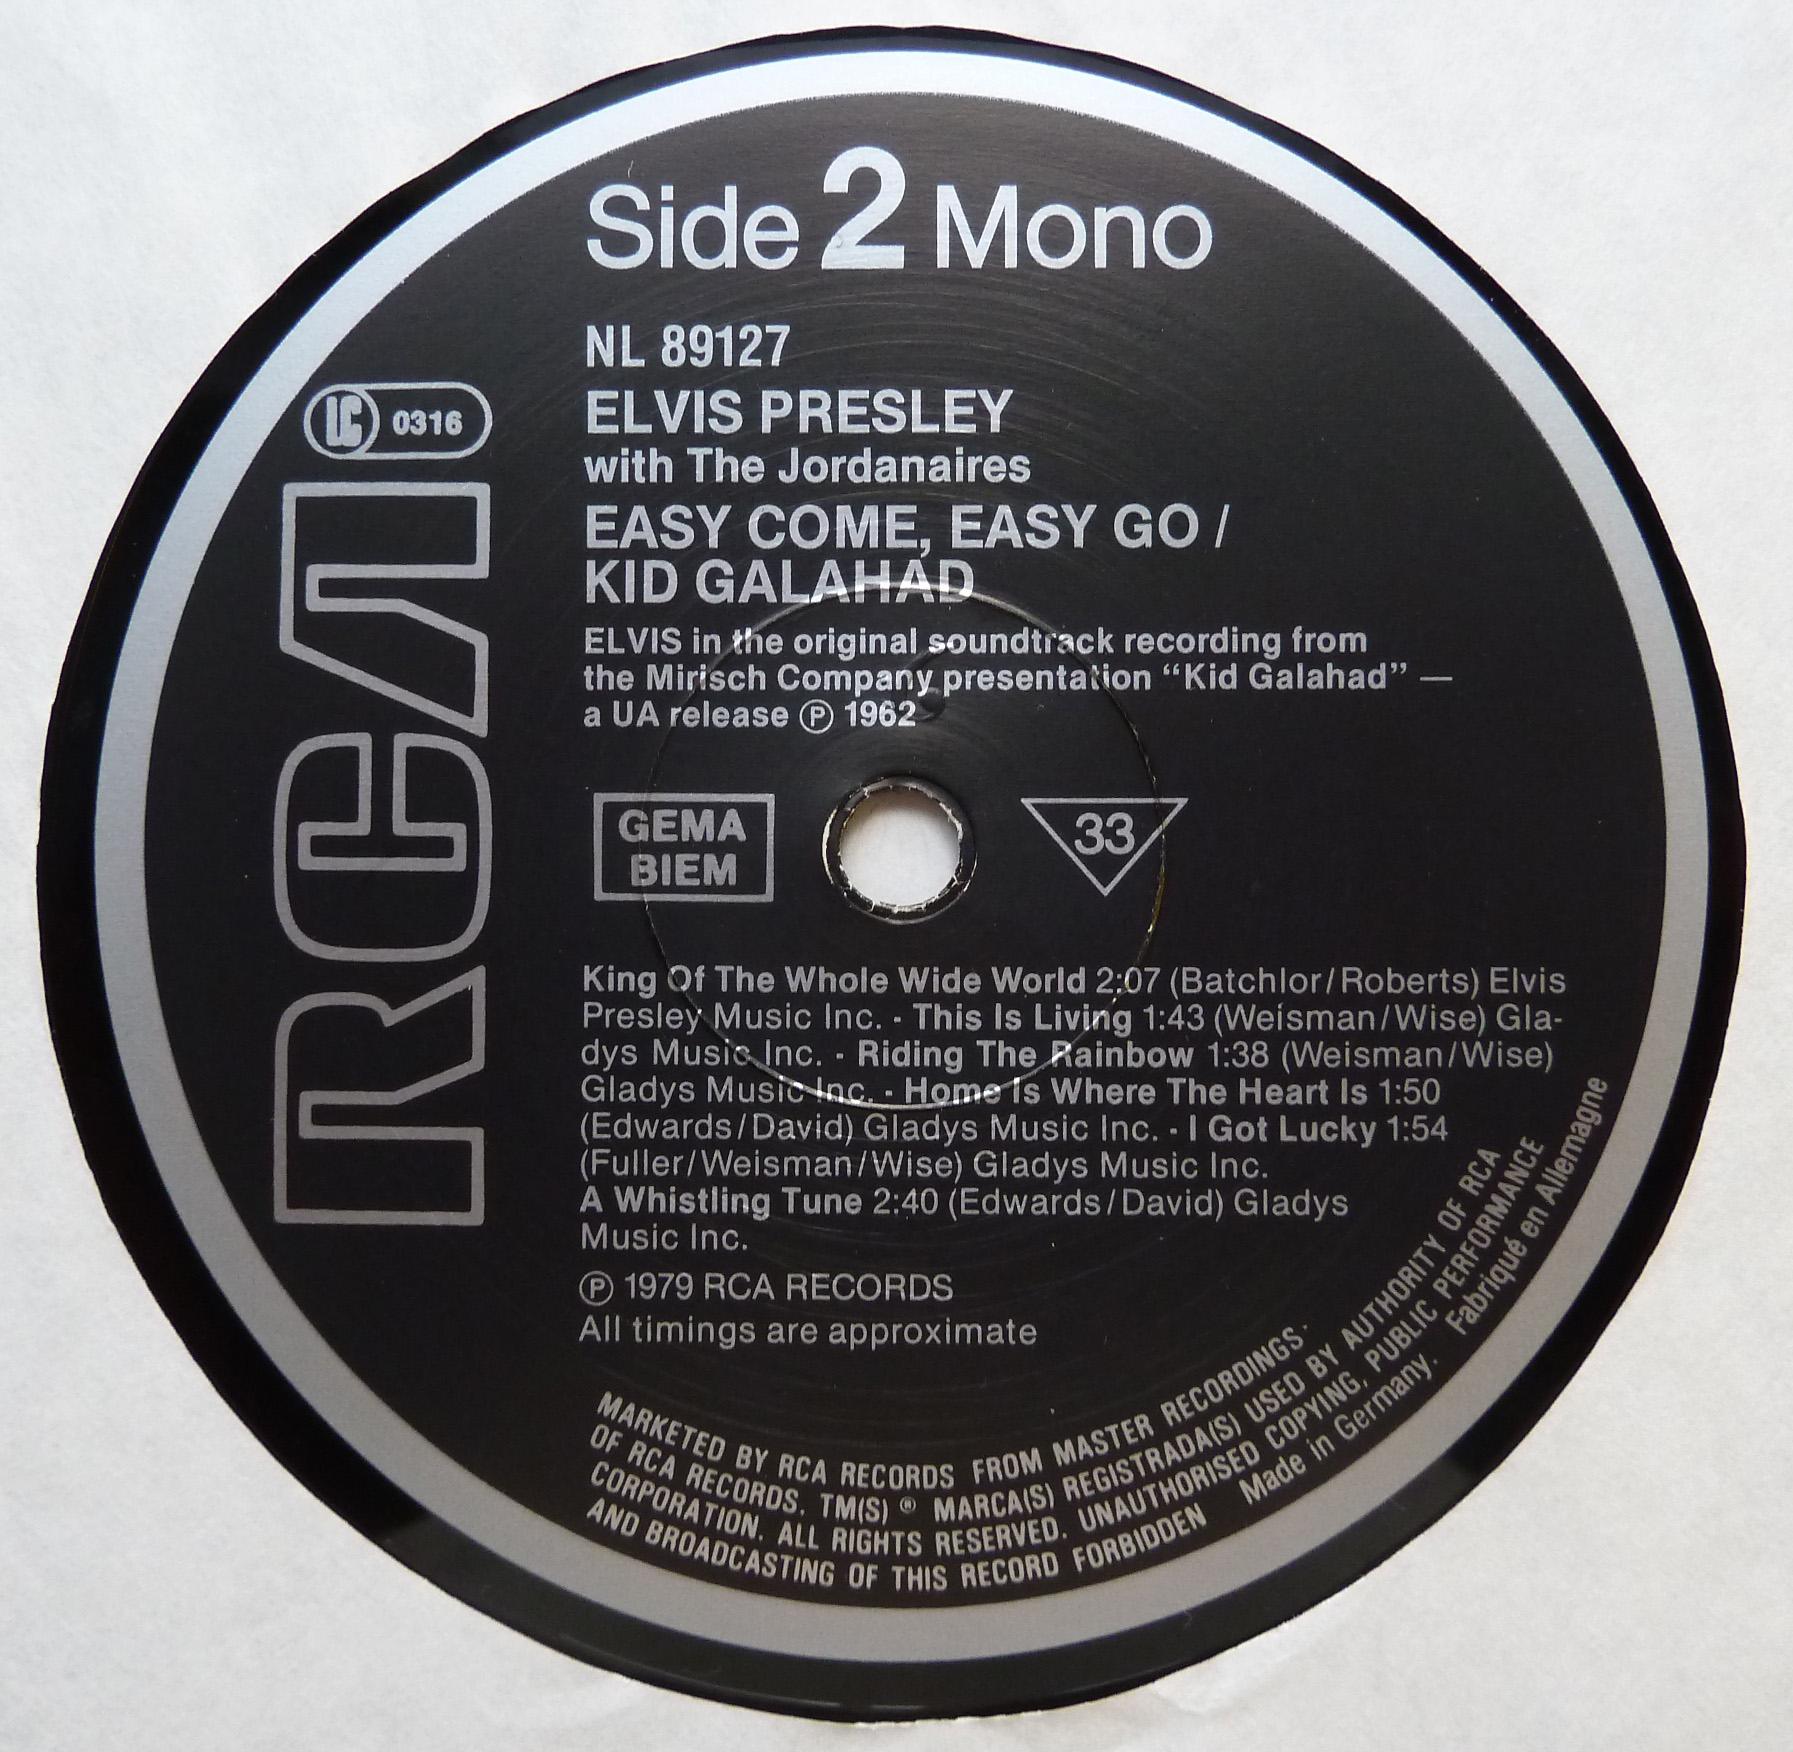 ORIGINAL SOUNDTRACKS: EASY COME EASY GO / KID GALAHAD Originalsoundtrackseaatiy6